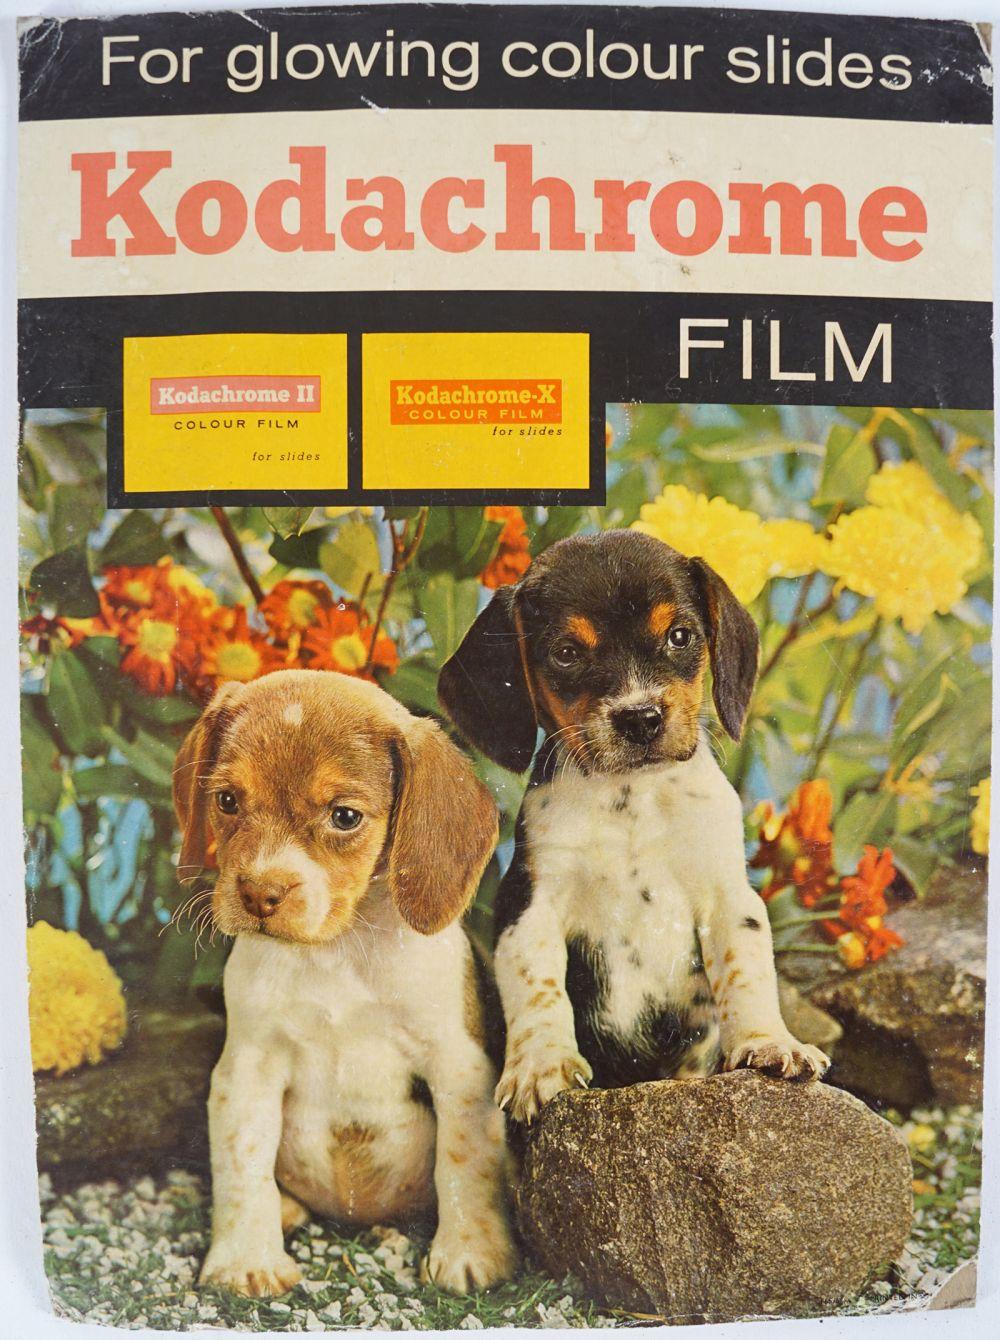 KODACHROME FILM ORIGINAL VINTAGE POSTER